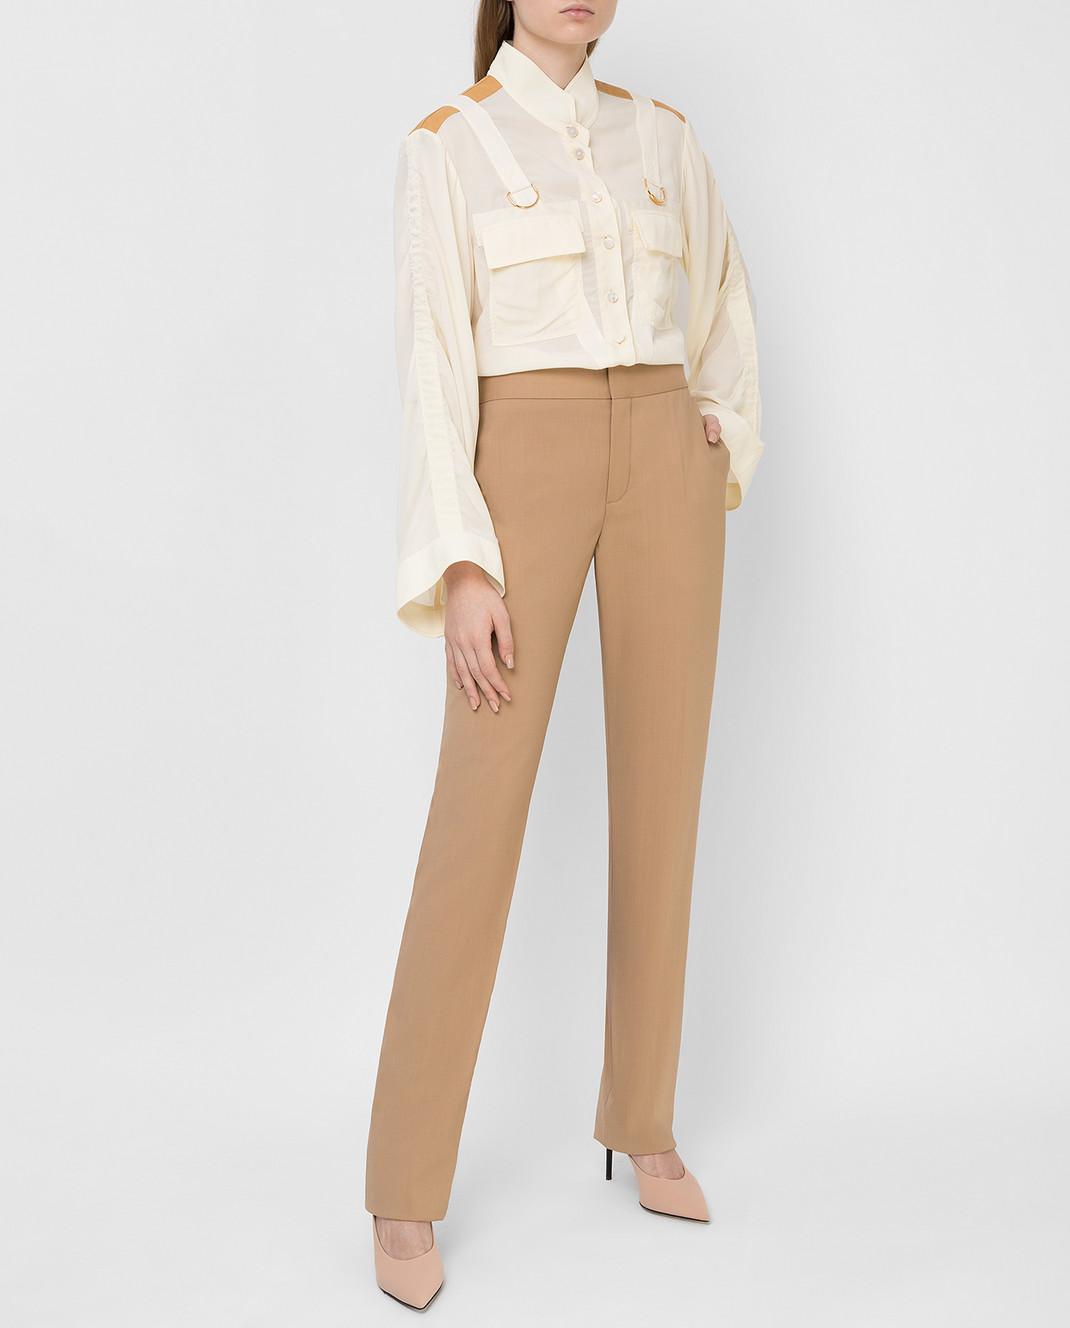 Chloe Бежевые брюки из шерсти 16SPA10 изображение 2